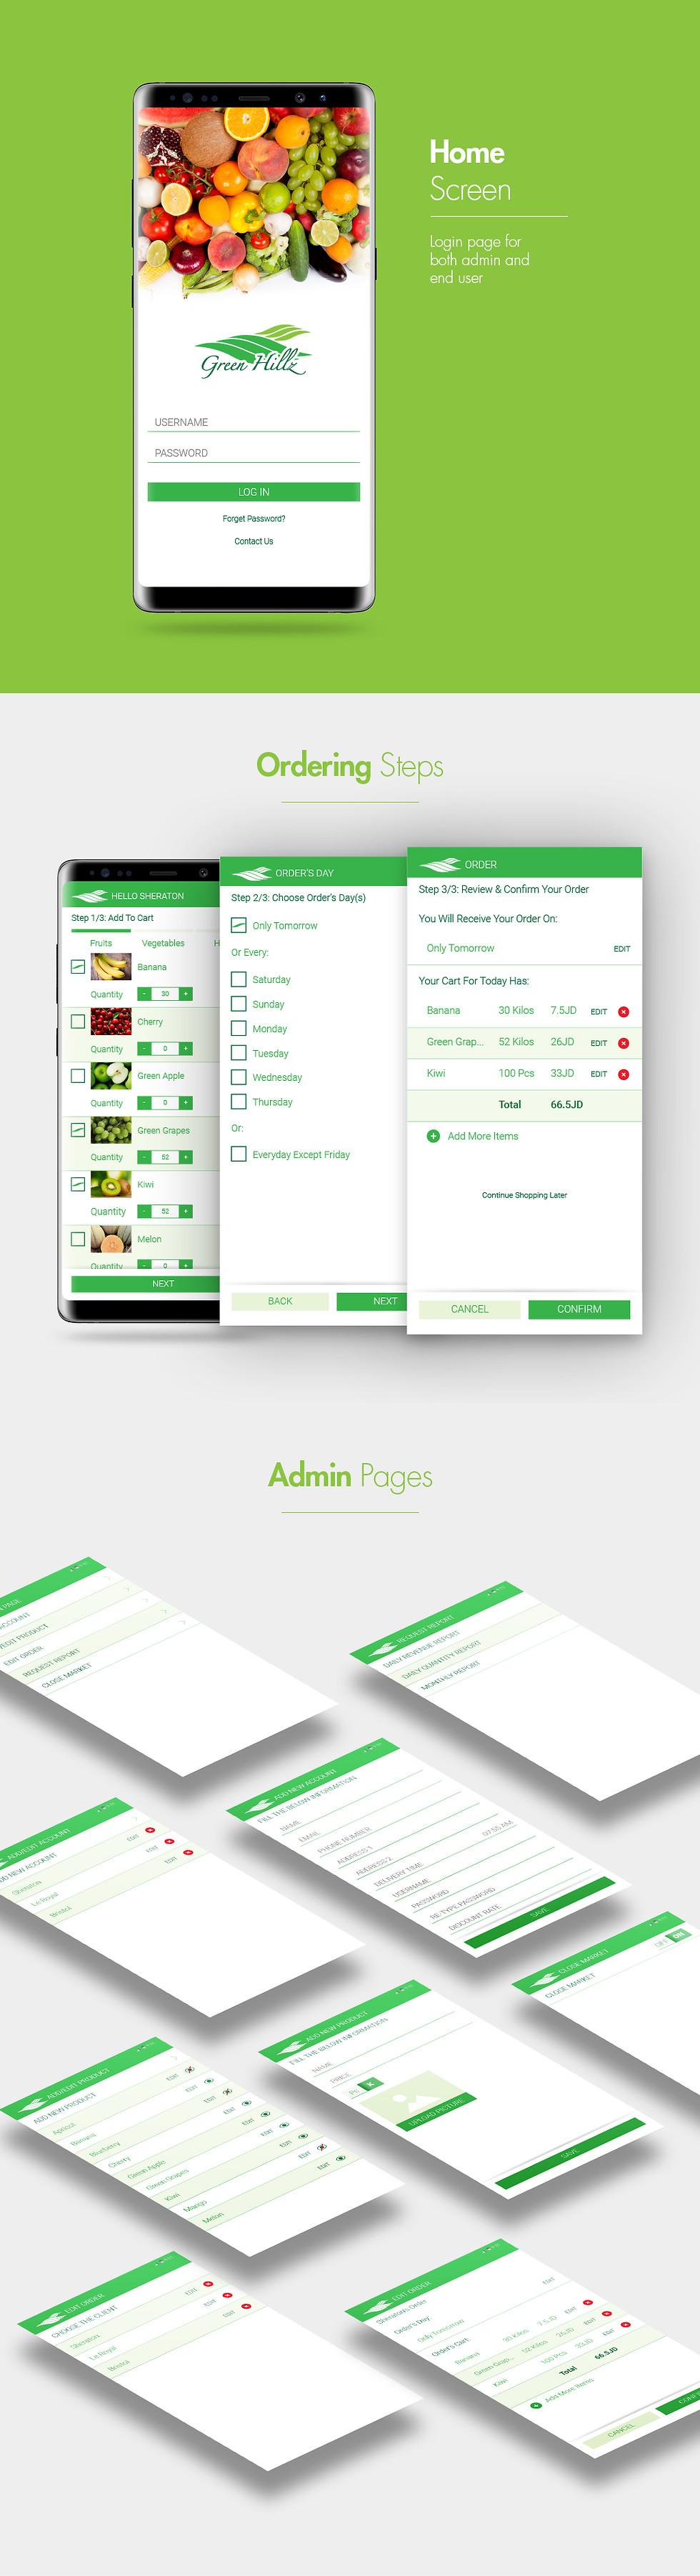 GreenHillz Mobile App Design